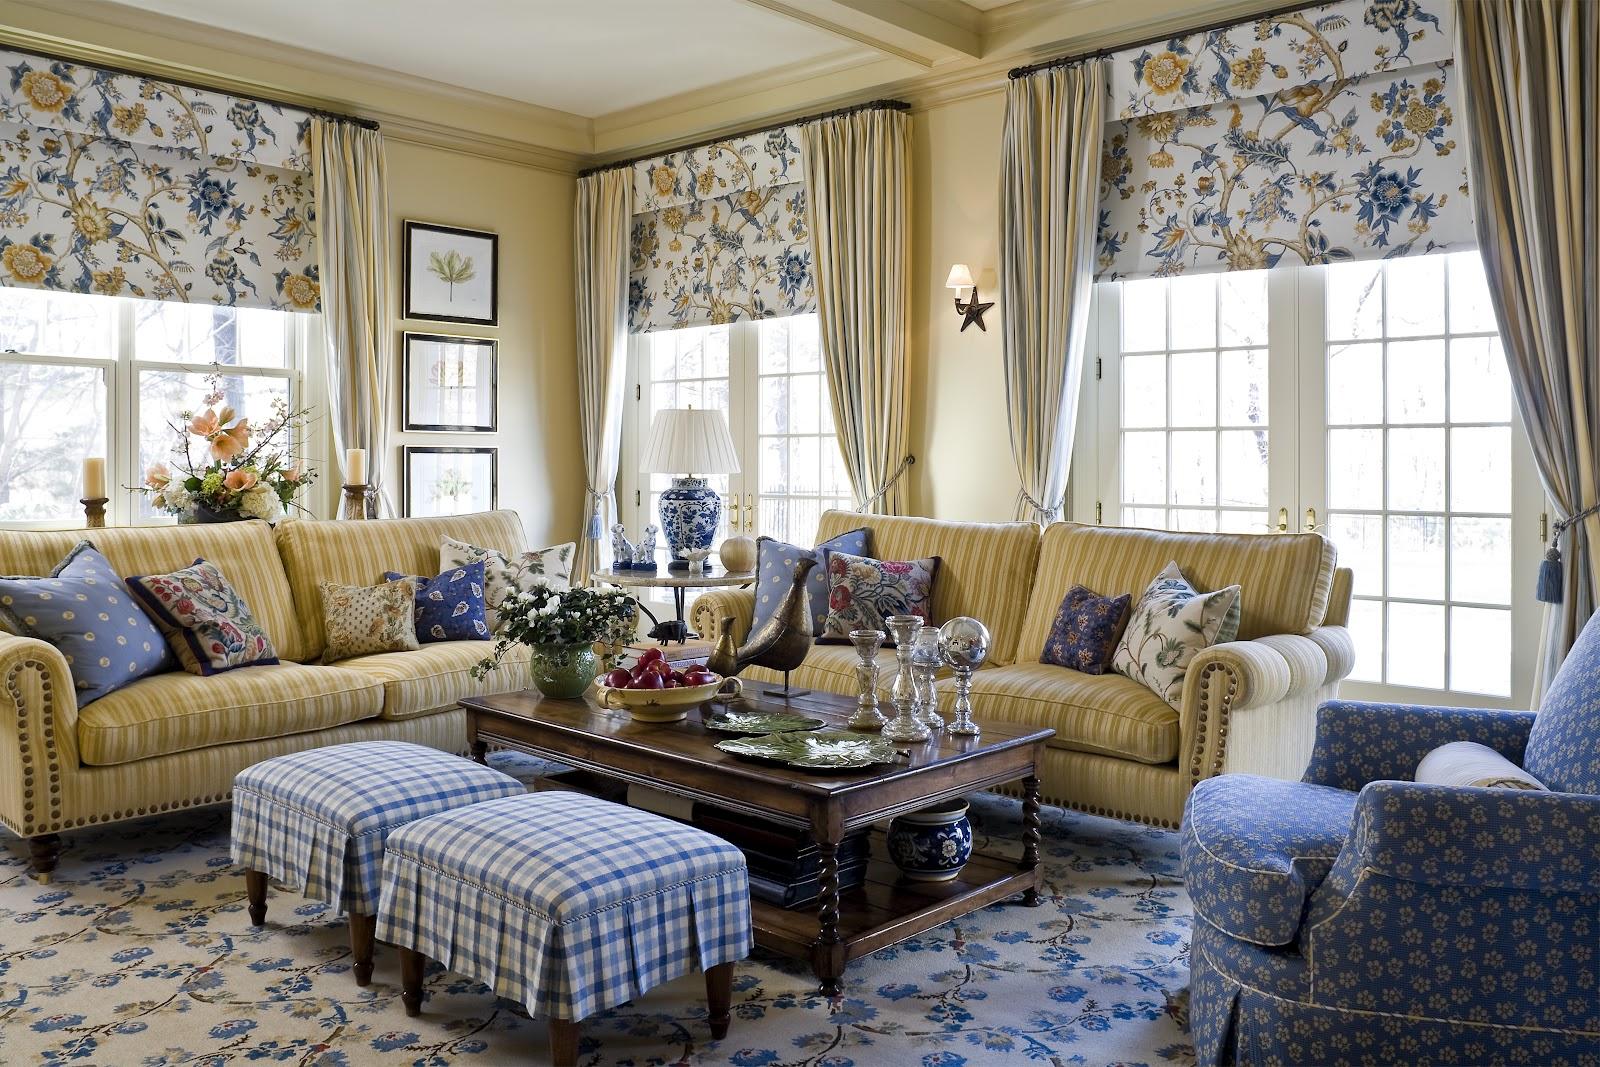 Текстиль и декор